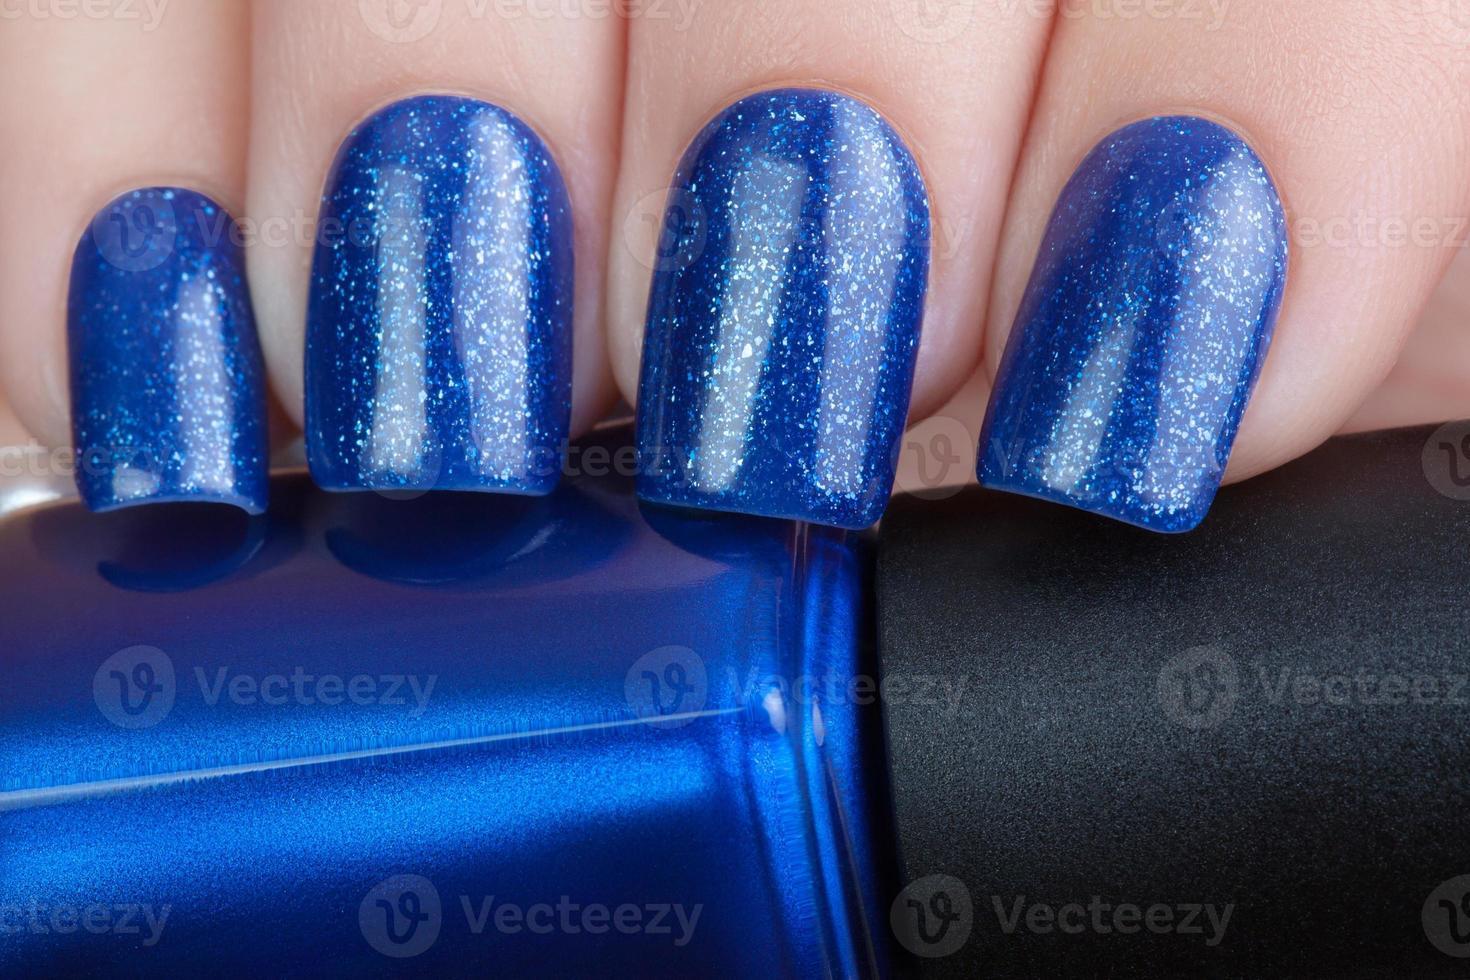 esmalte de uñas azul. foto